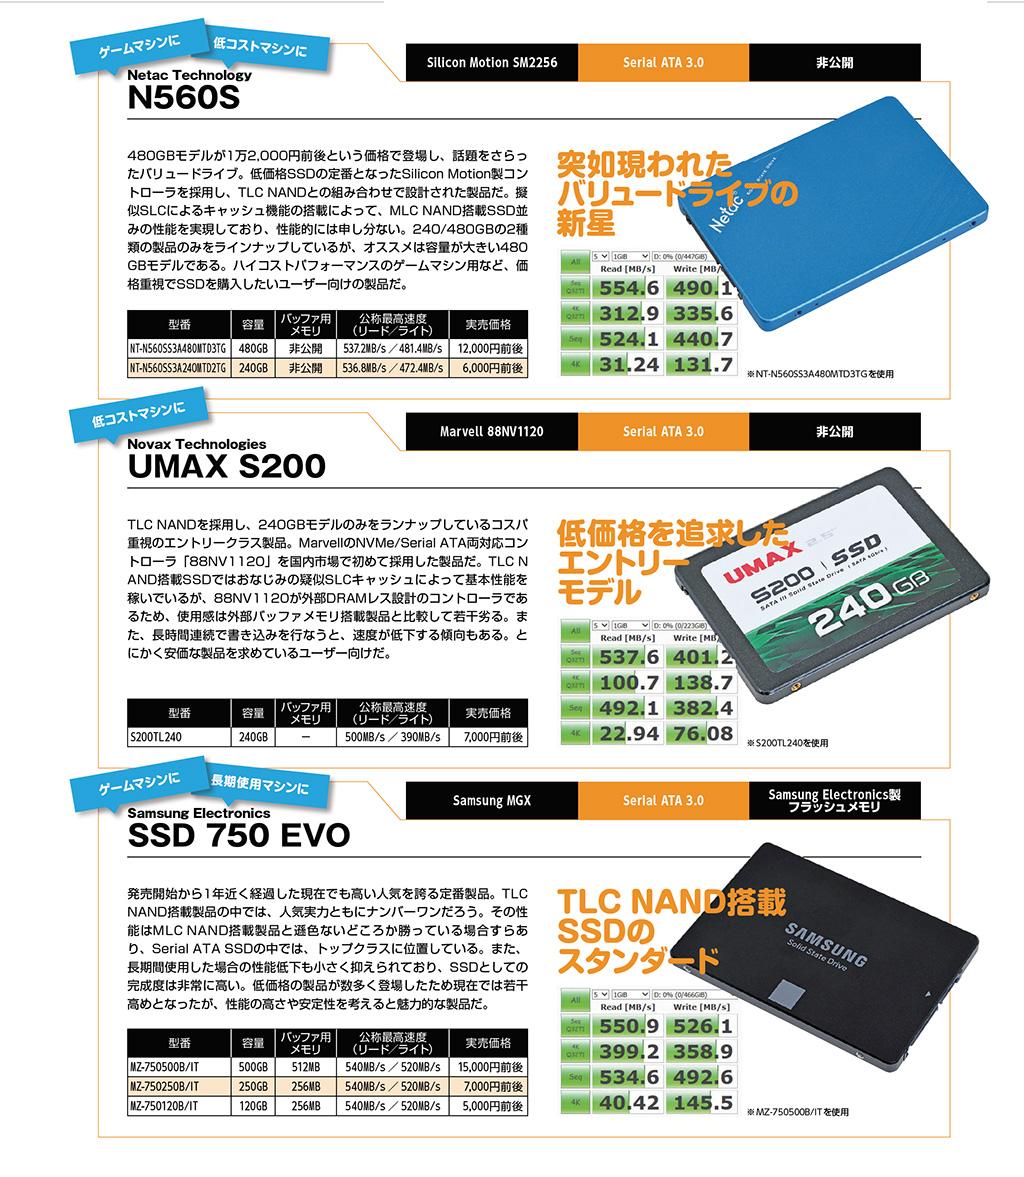 Netac Technology N560S / Novax Technologies UMAX S200 / Samsung Electronics SSD 750 EVO